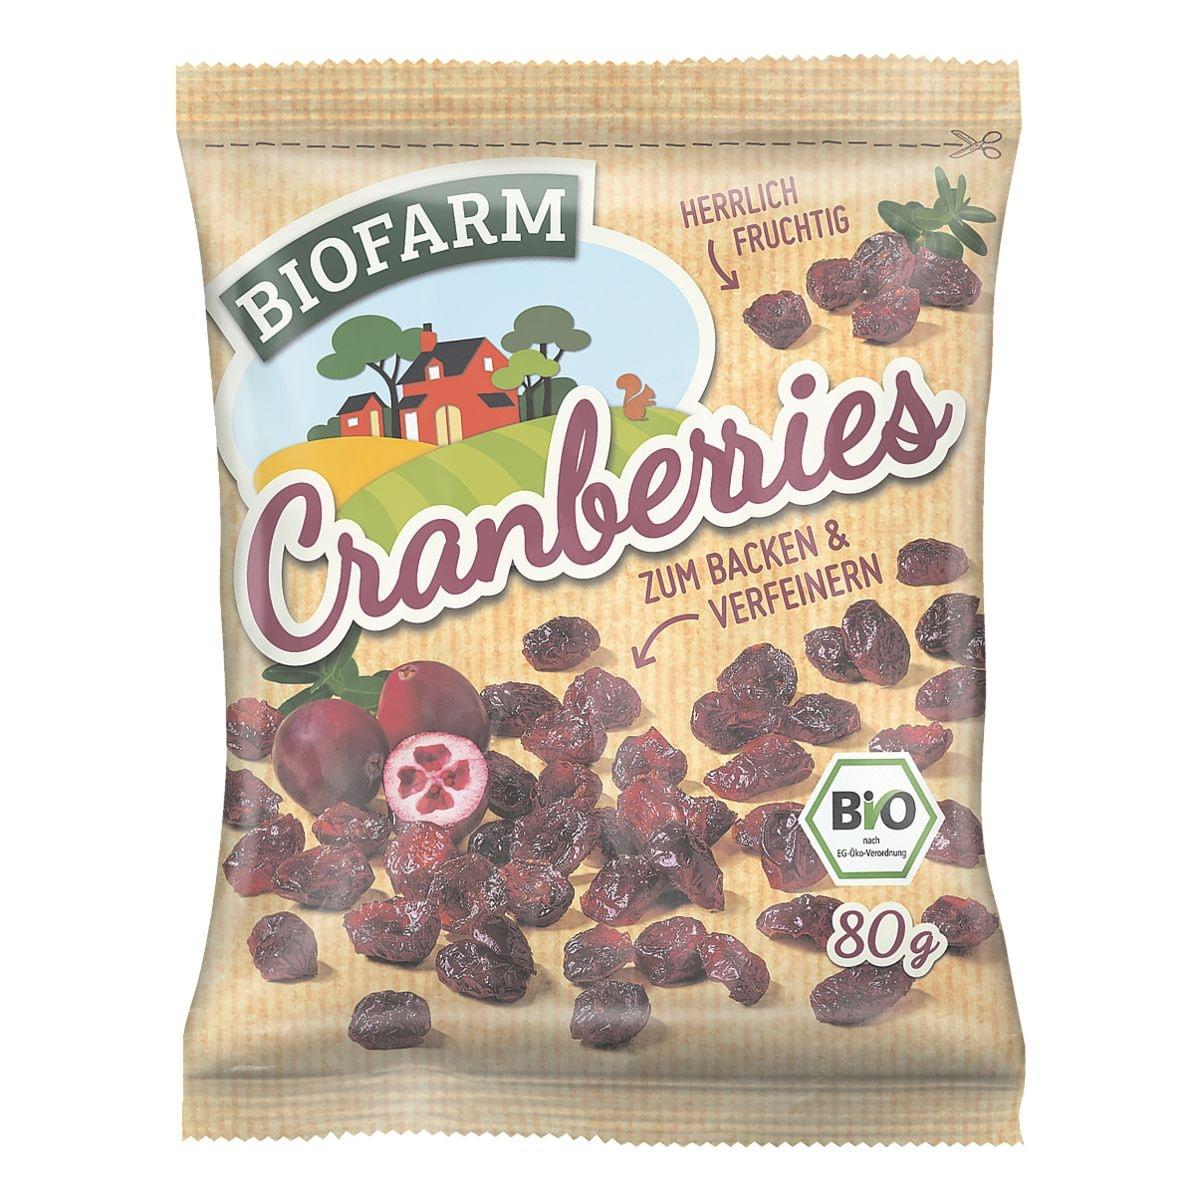 BIOFARM Cranberries 80 g